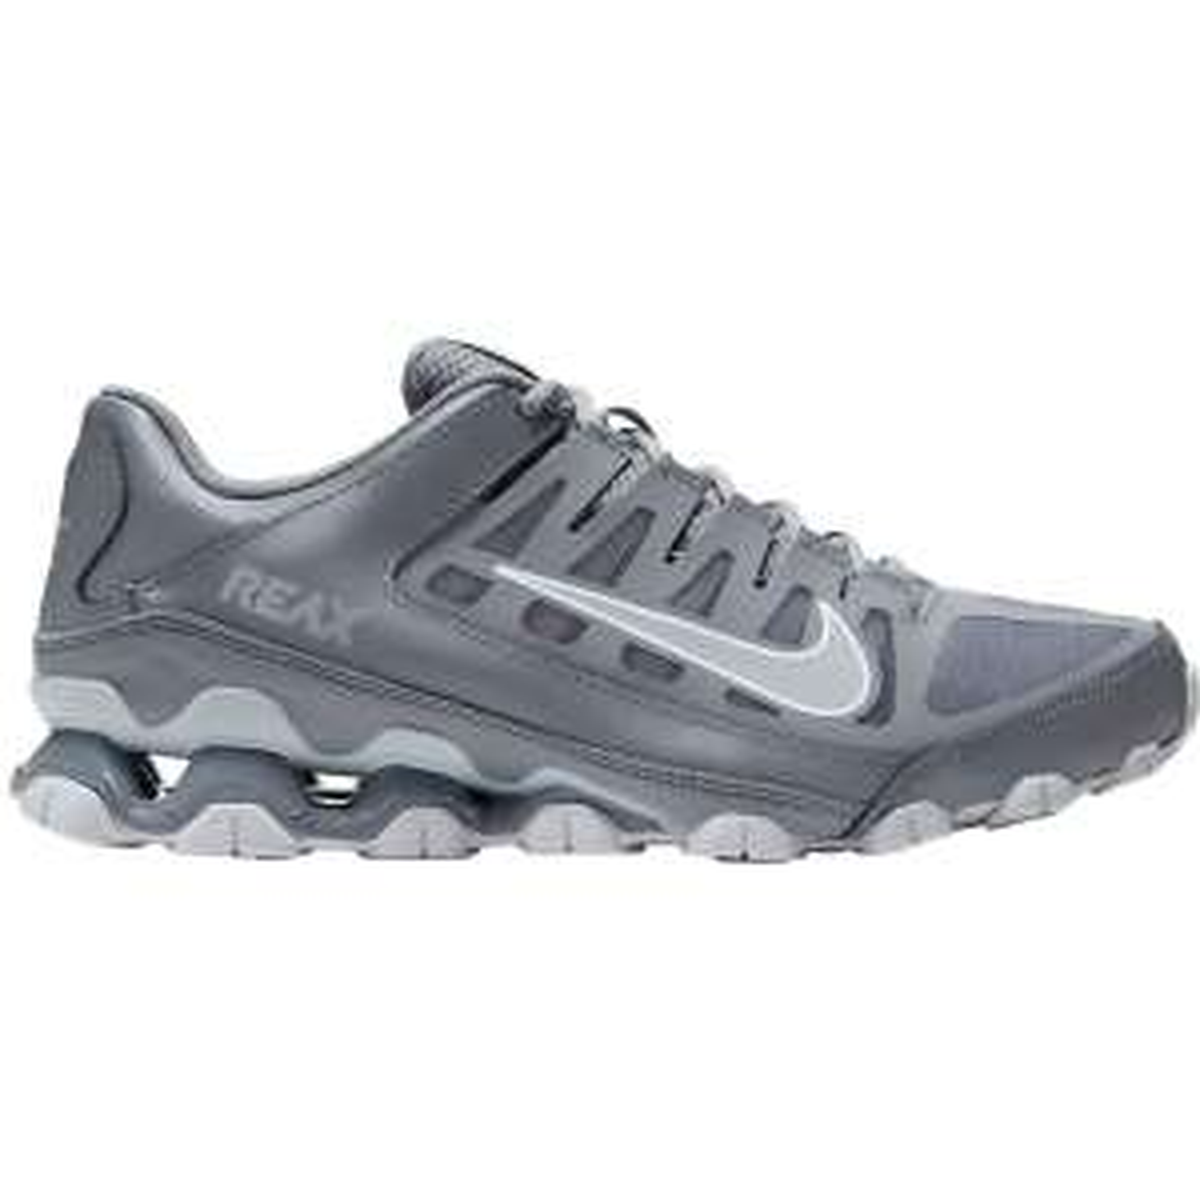 "Nike Trainingsschuh ""Reax 8 TR"", alle Größen verfügbar"